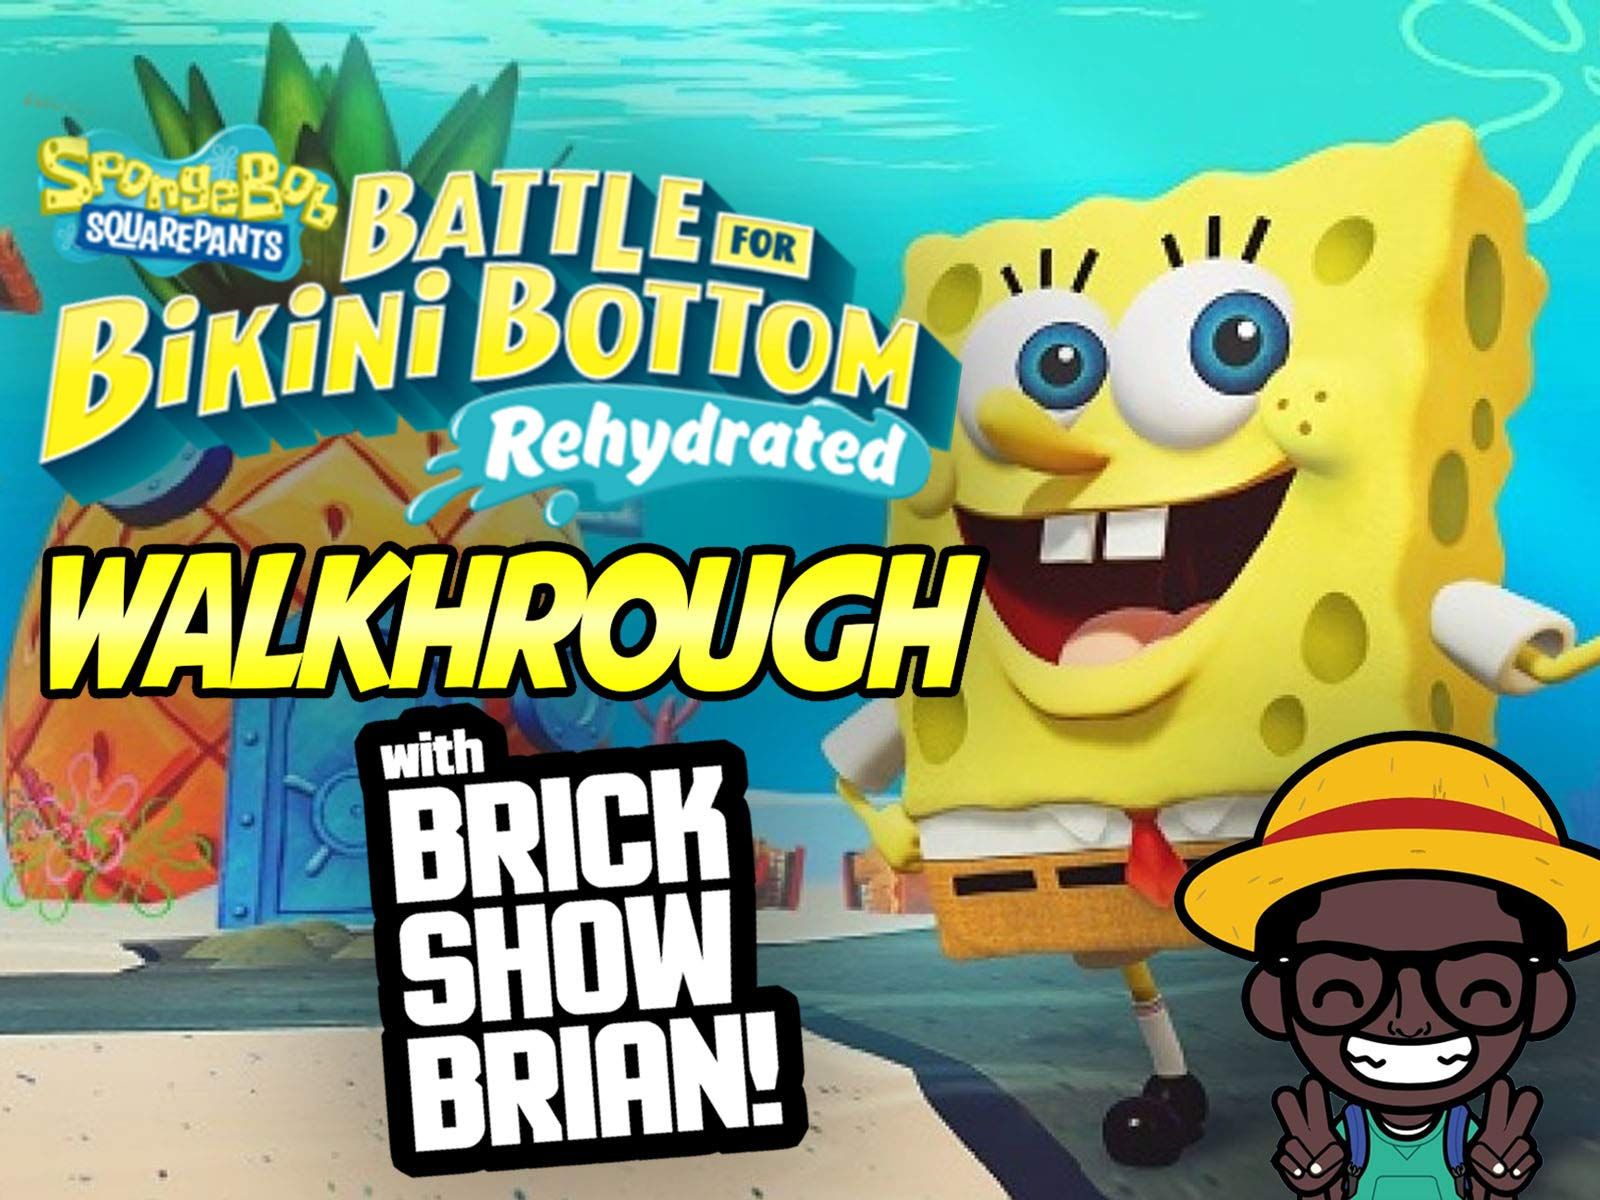 Spongebob Squarepants Battle With Bikini Bottom Rehydrated Walkthrough With Brick Show Brian - Season 1